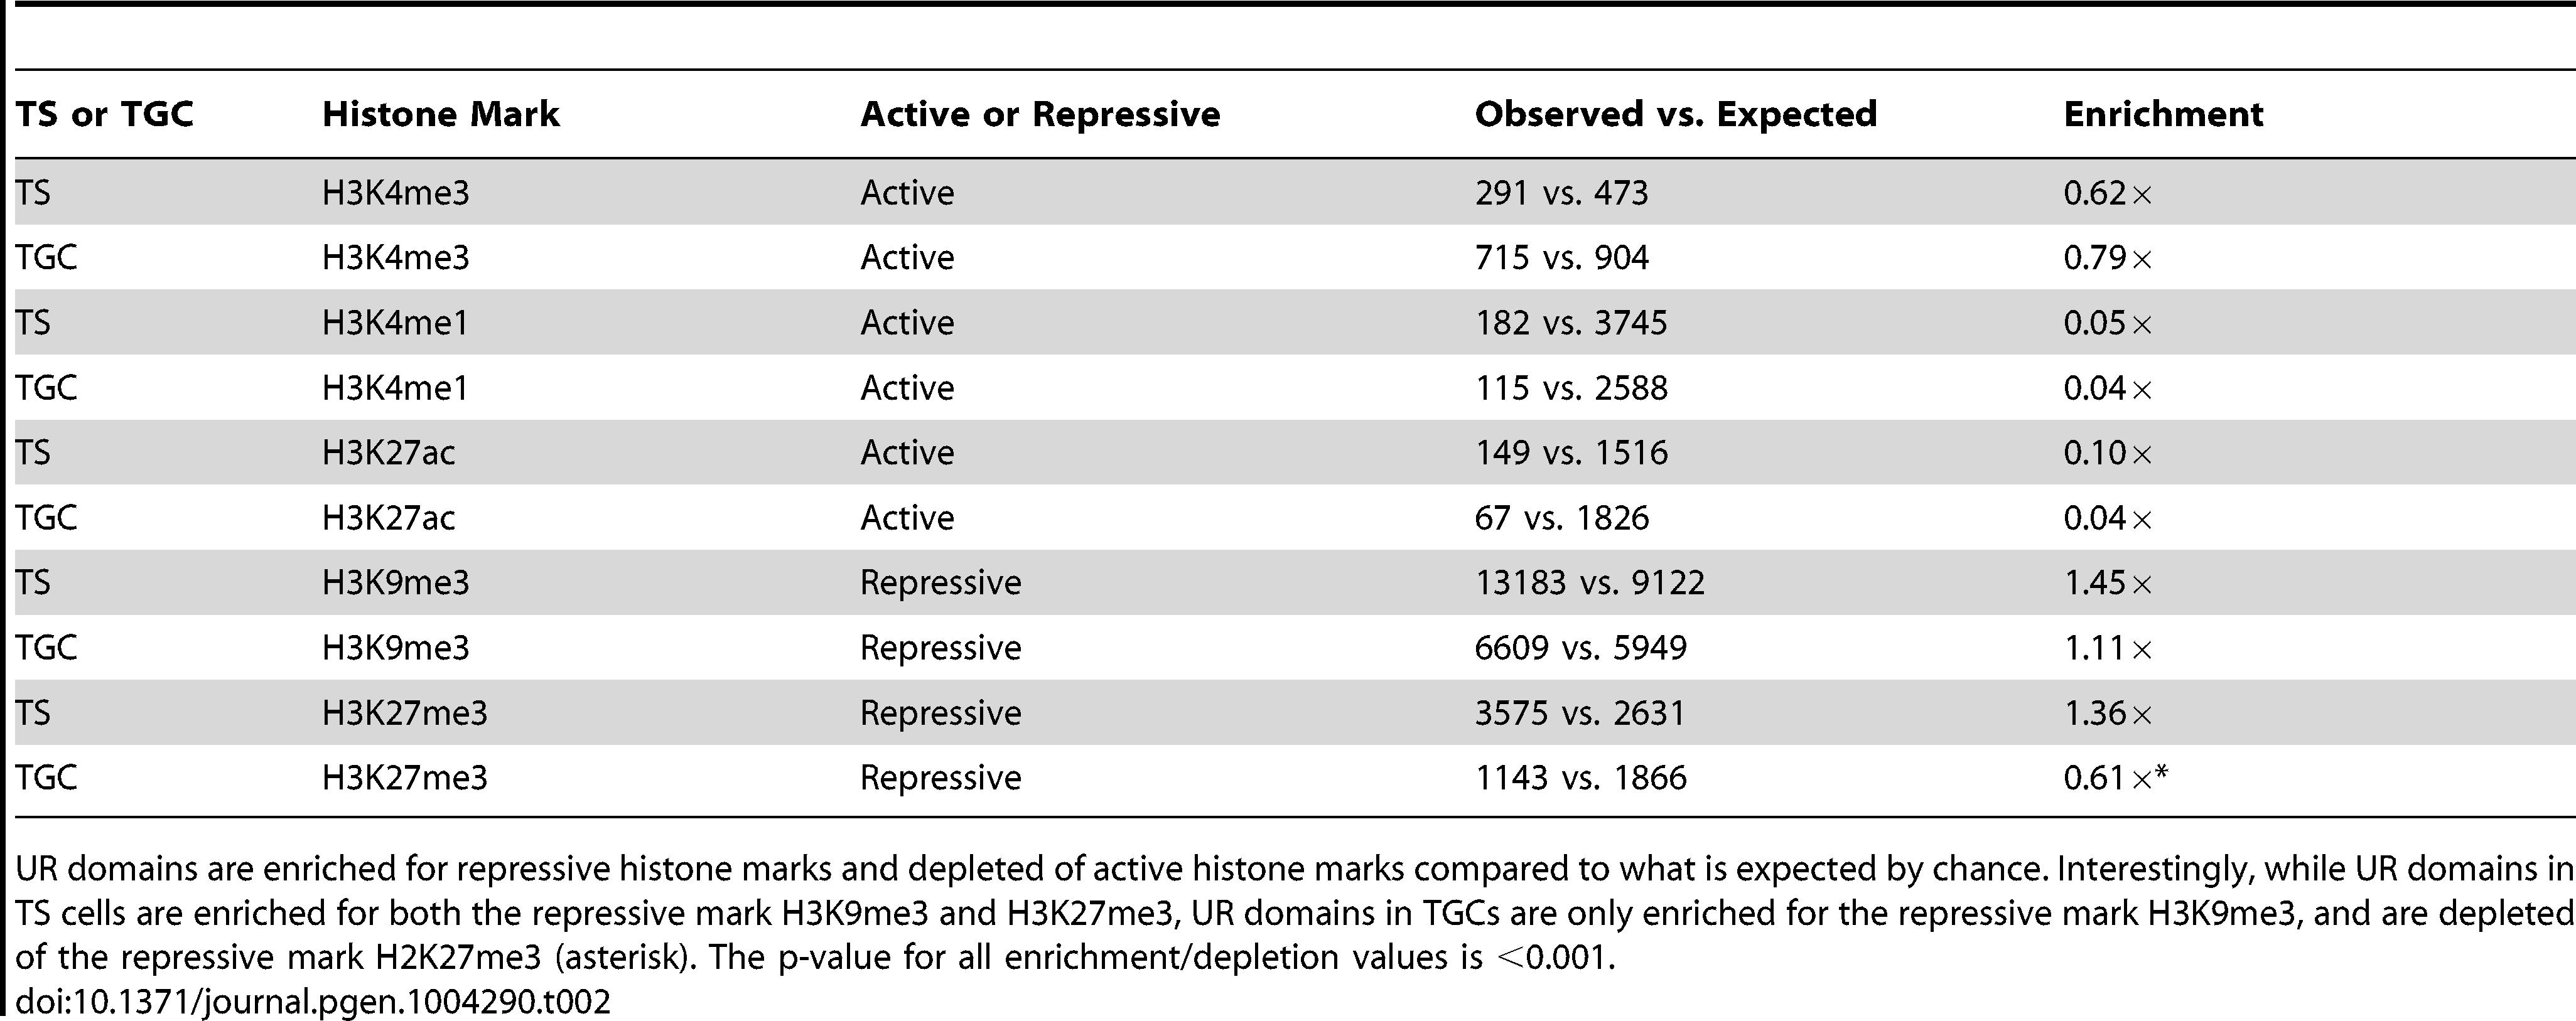 UR domains are heterochromatic.